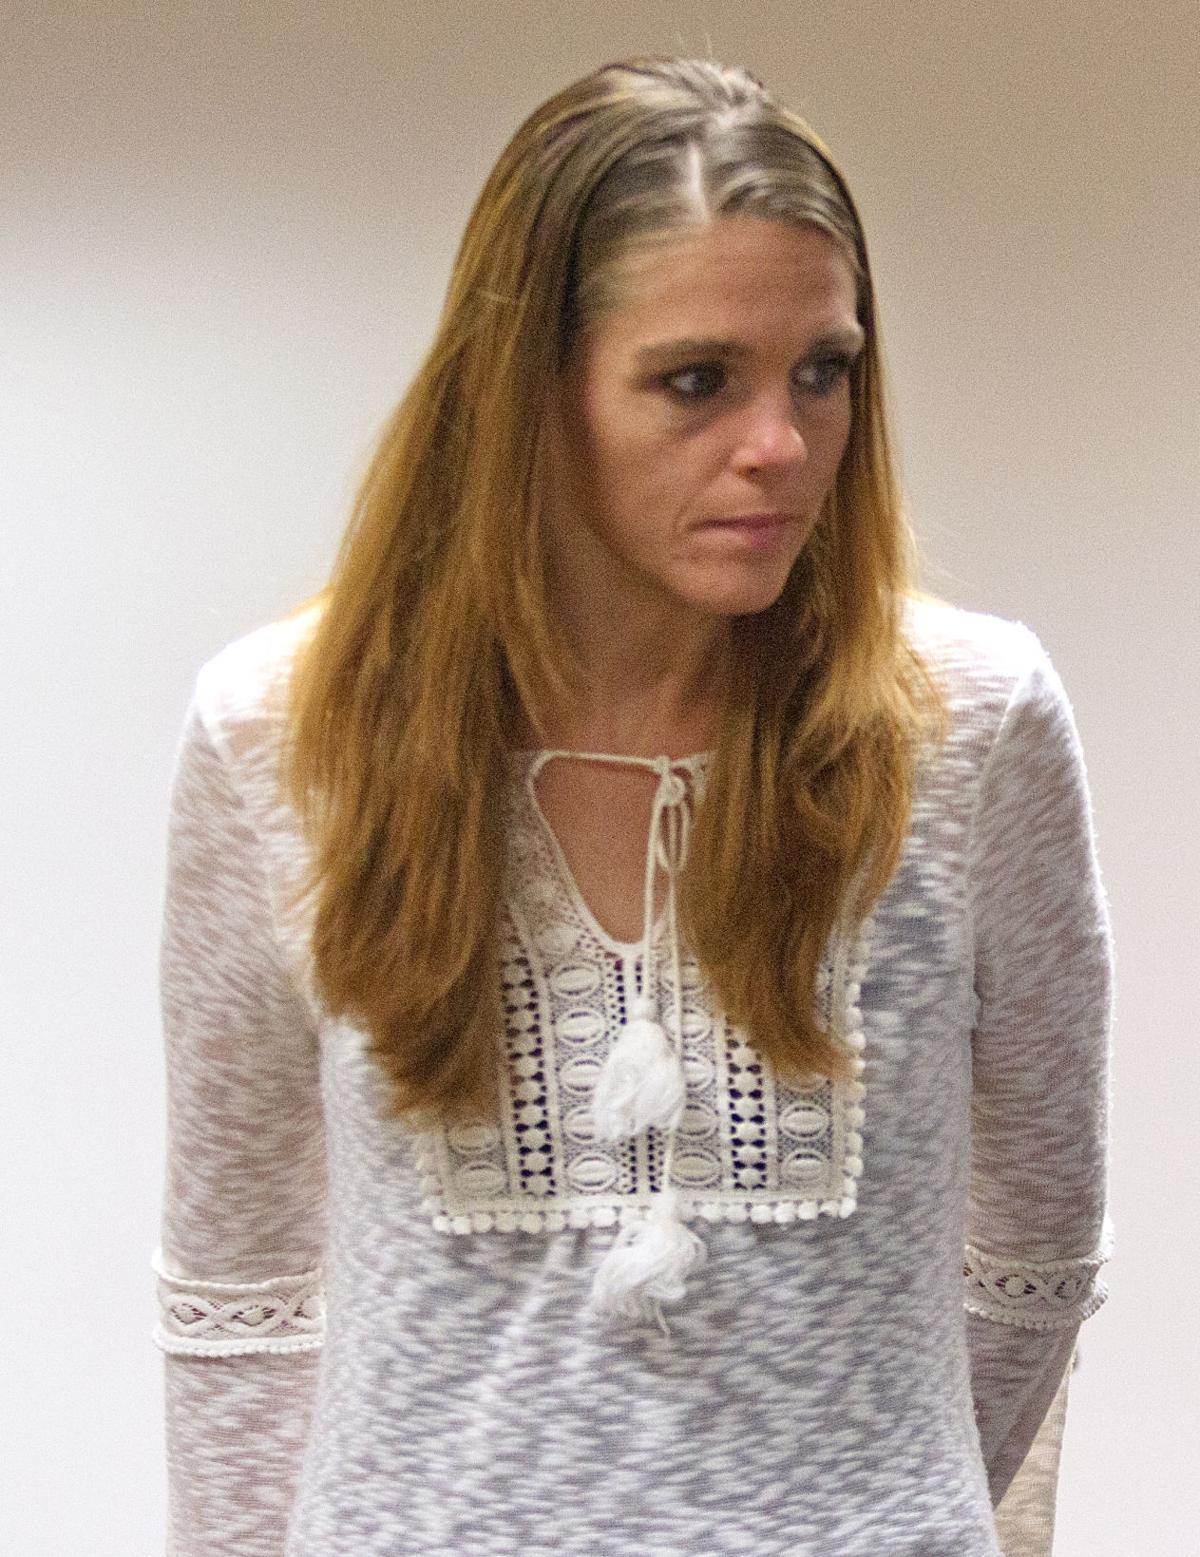 Winnett preliminary hearing